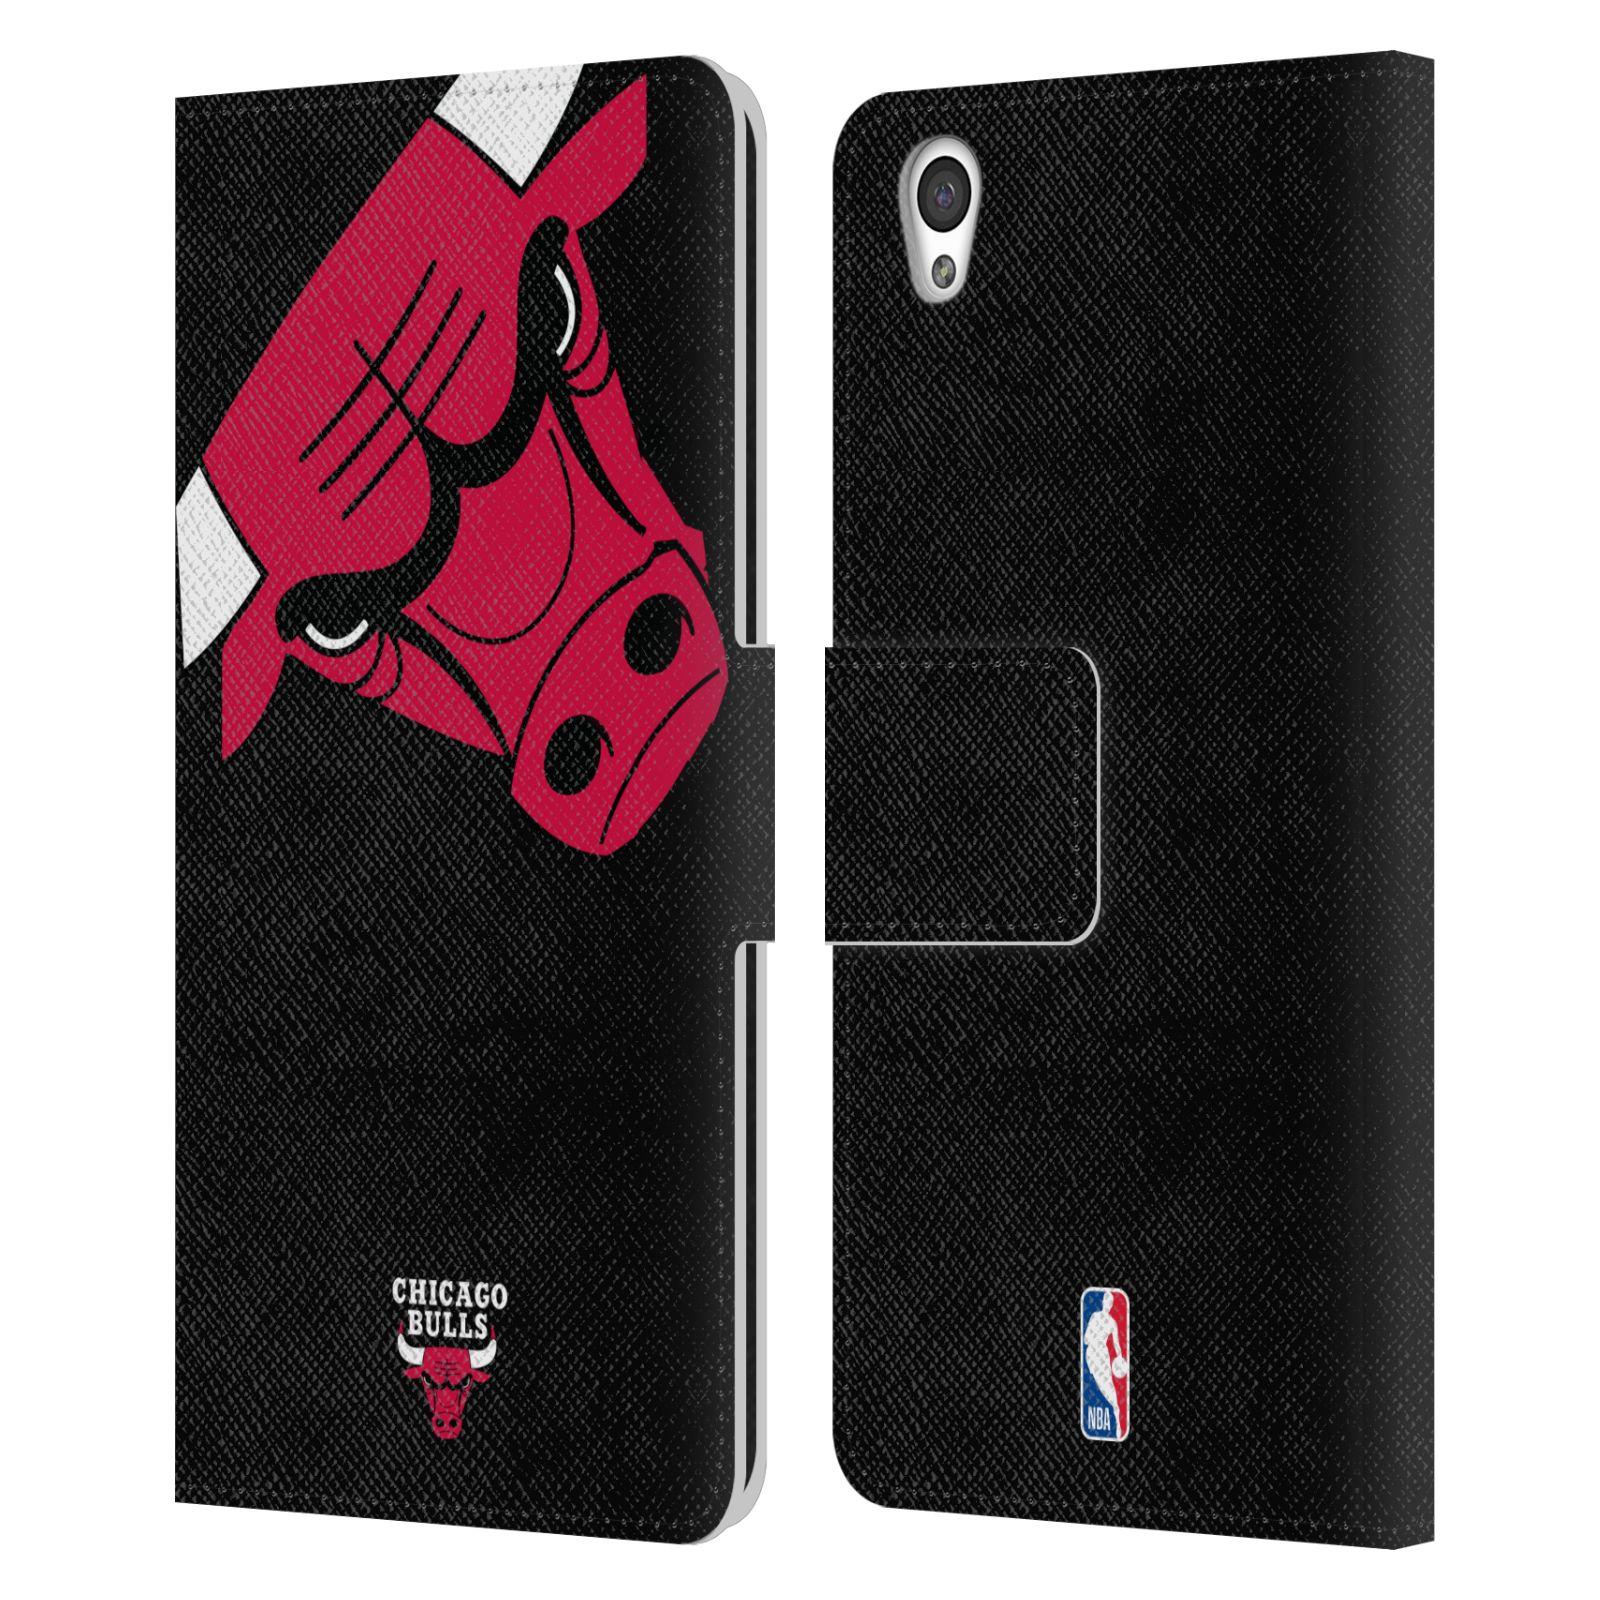 Pouzdro na mobil OnePlus X - Head Case -NBA - Chicago Bulls červená barva velký znak